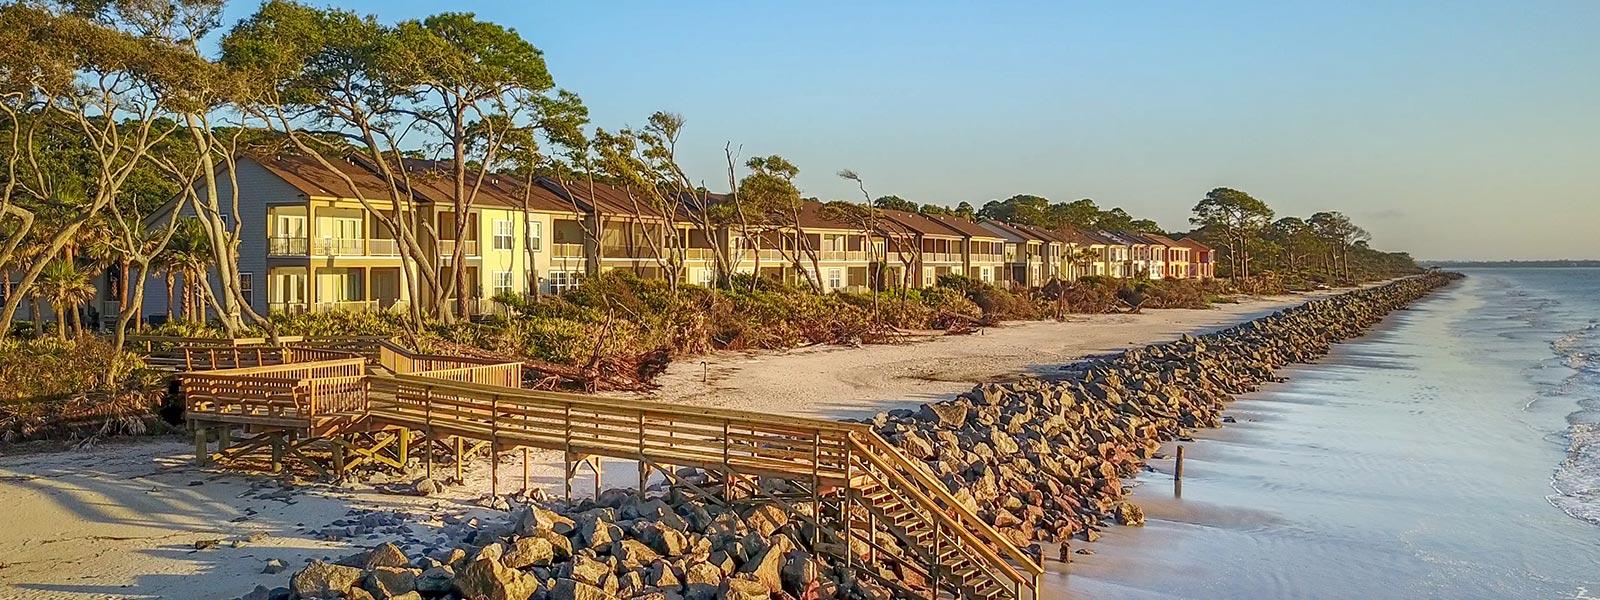 Beach Vacation Rentals on Jekyll Island